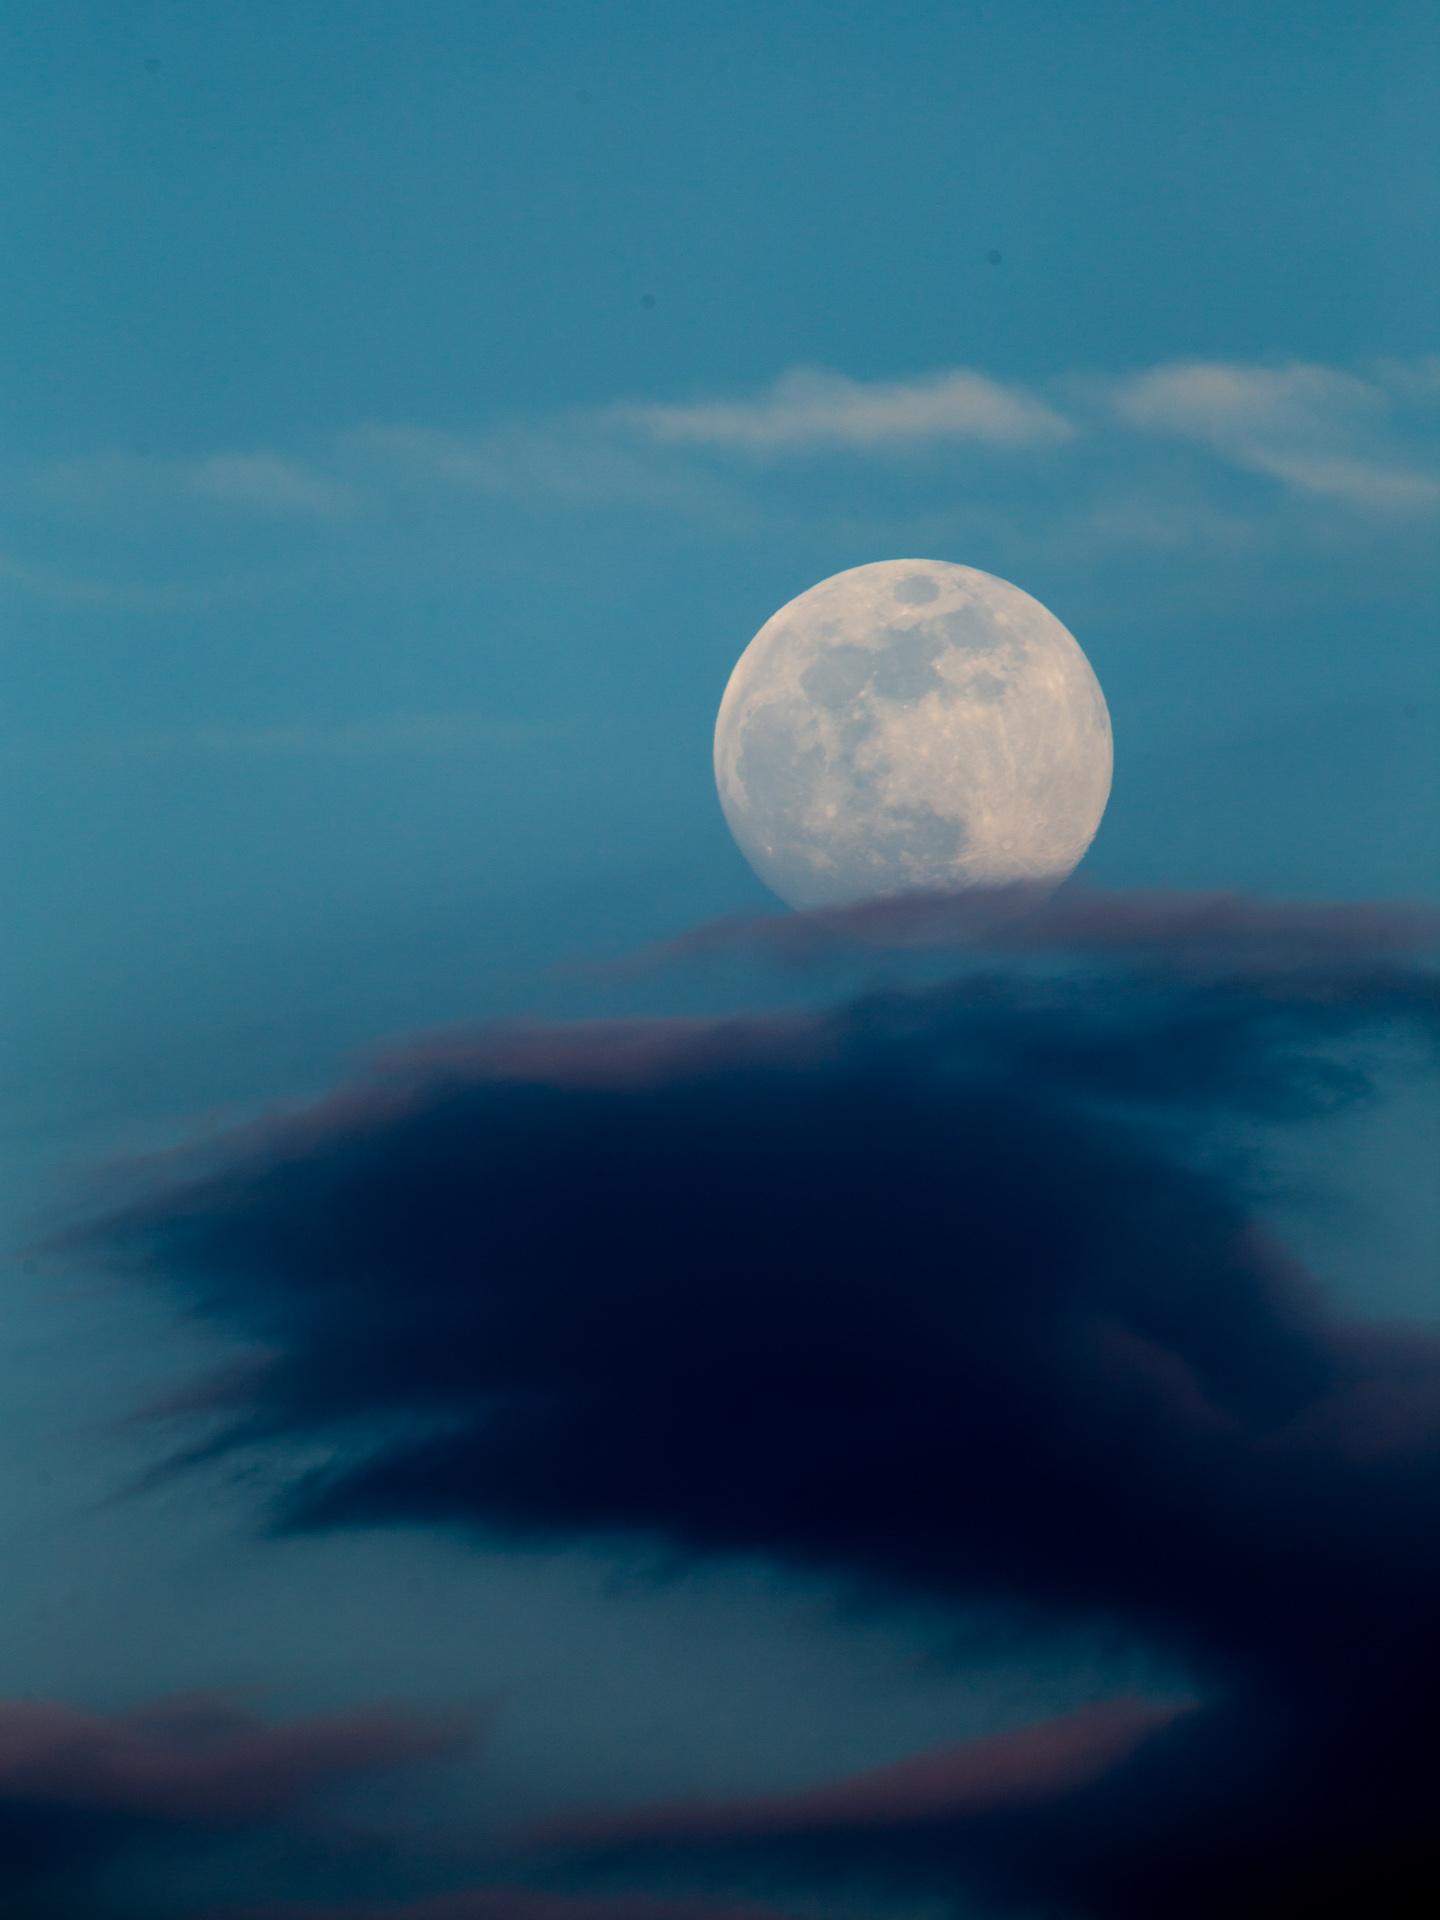 Moon Rise | 20190517 1945 E:38.96x77.00@84m